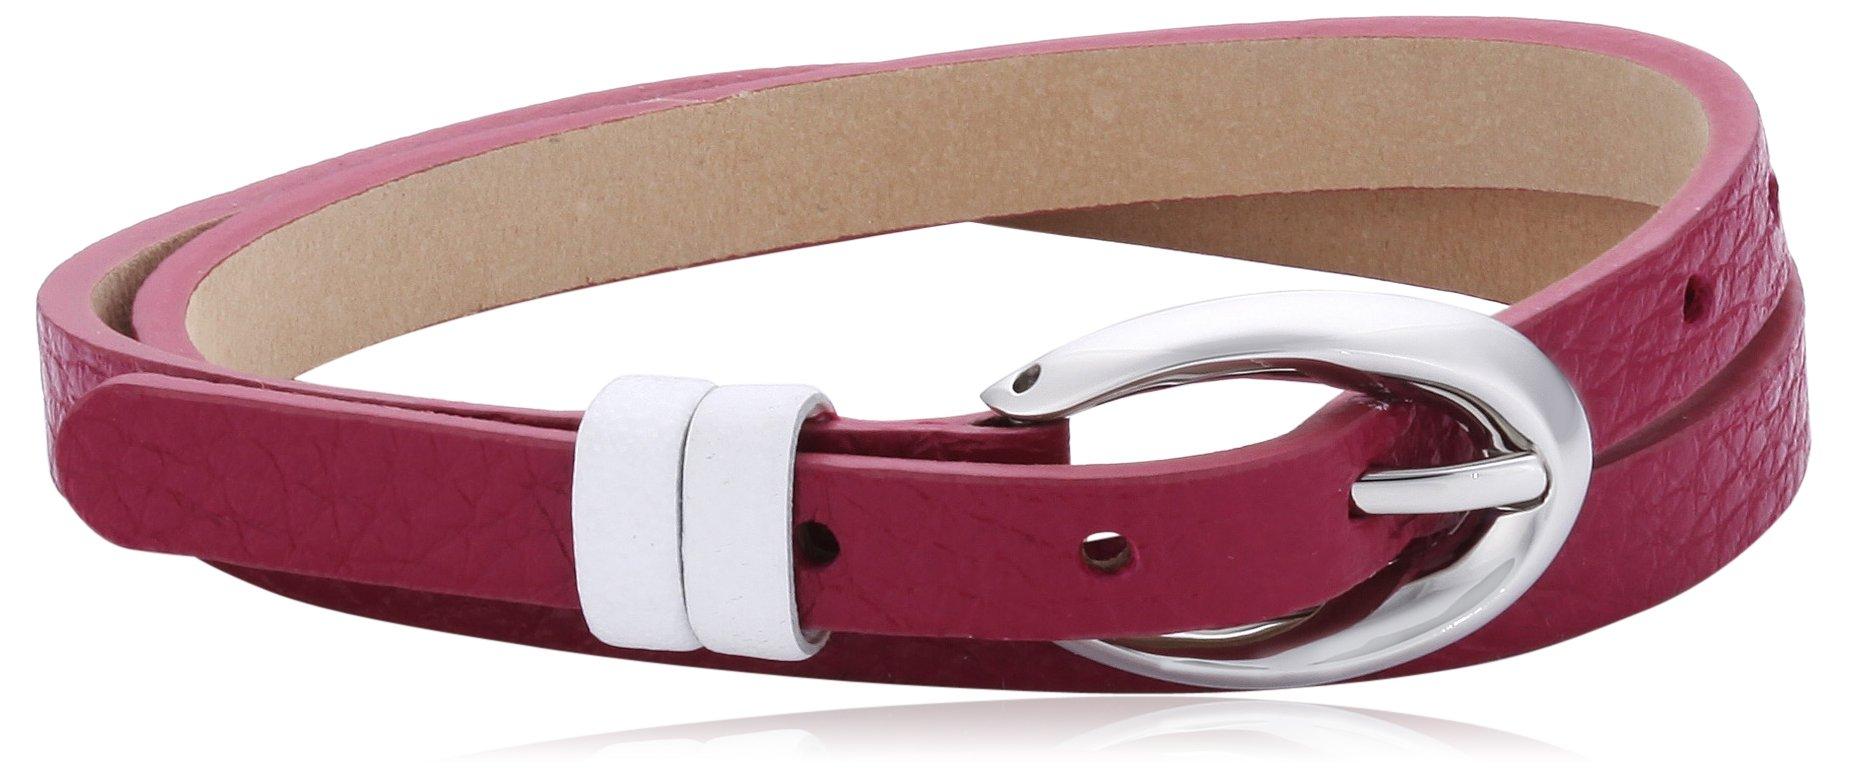 Esprit ESBR11336G380 Rio Orchid Pink Bracelet